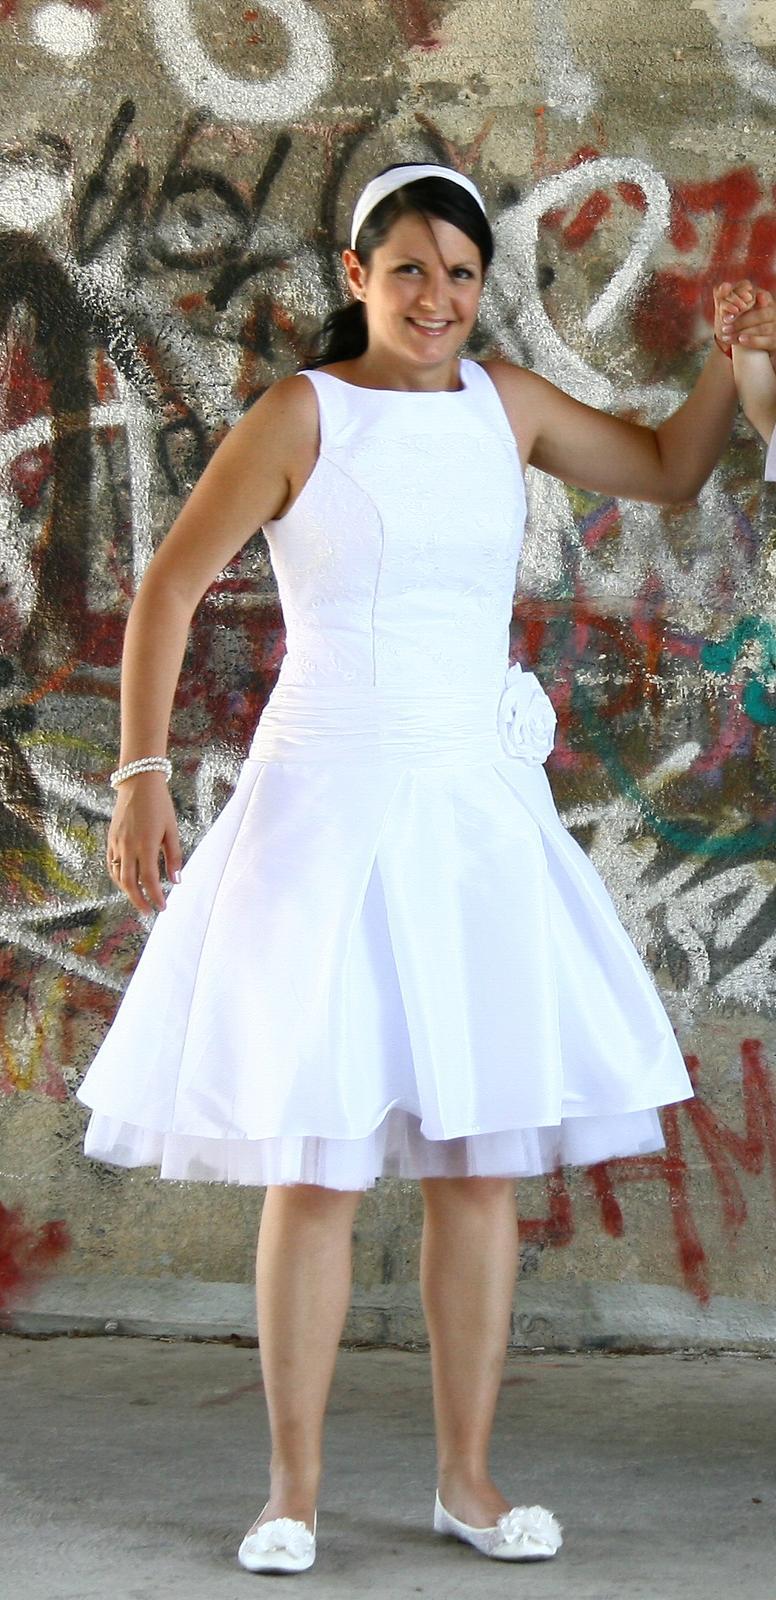 9562d11c46a0 Krátke retro šaty